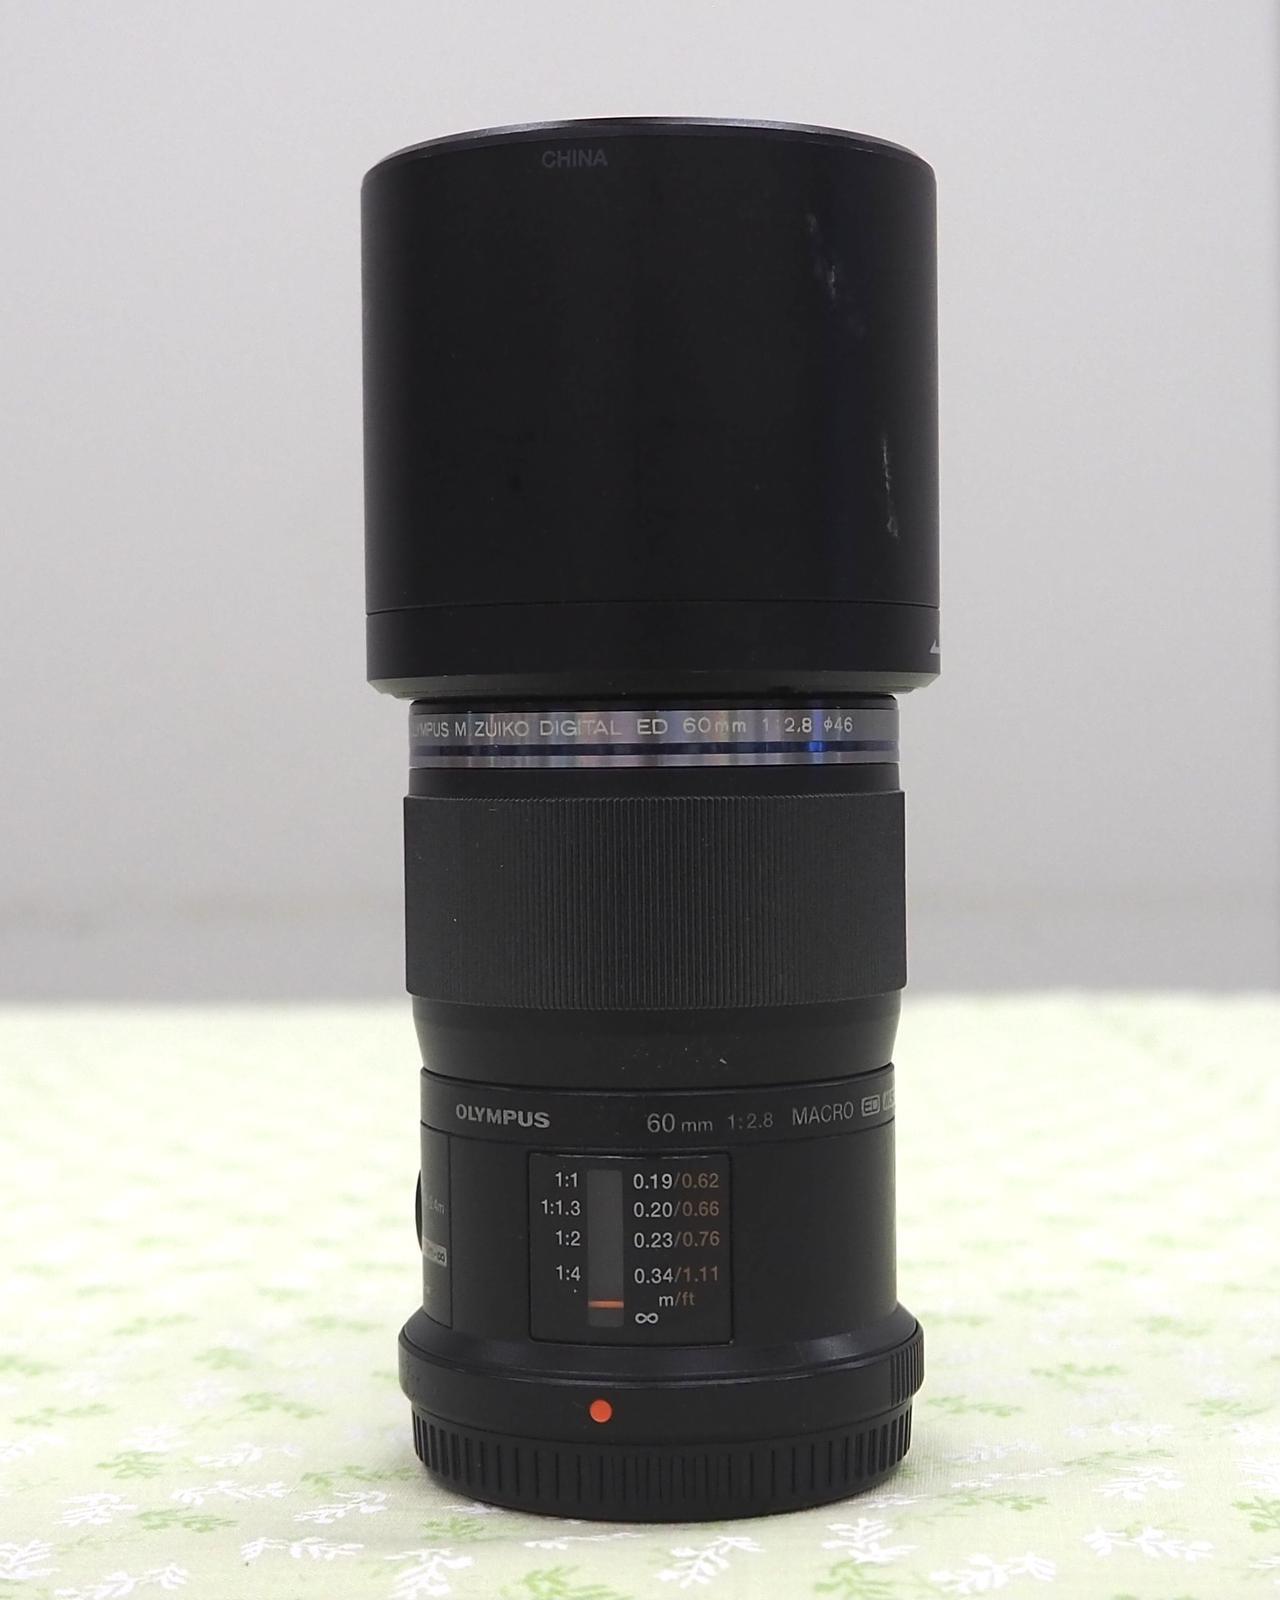 画像: M.ZUIKO DIGITAL ED 60mm F2.8 Macro